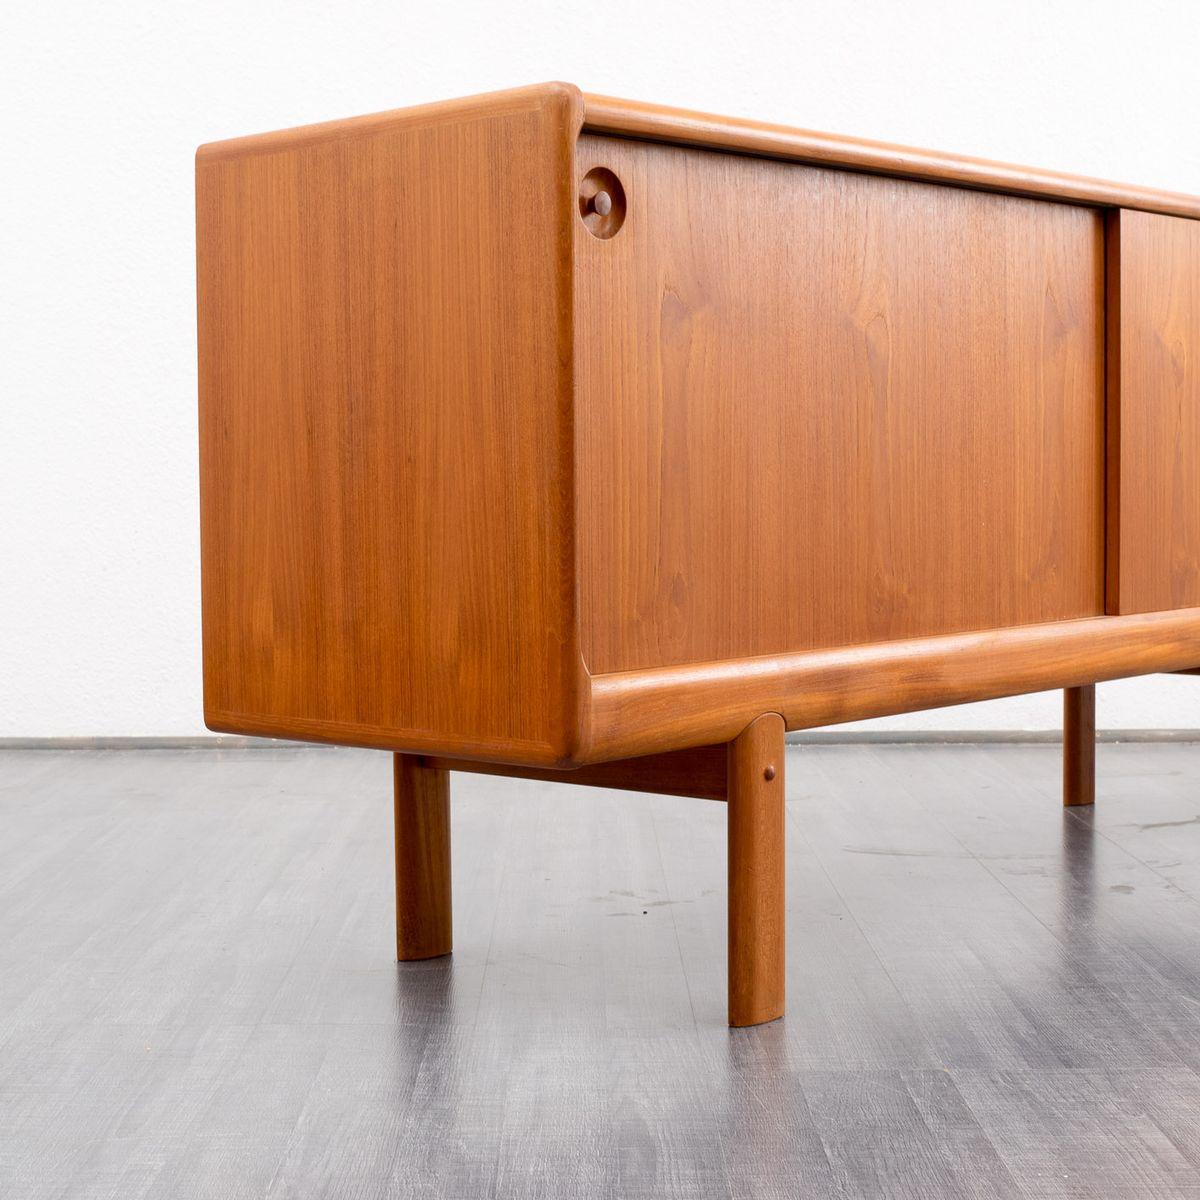 skandinavisches teak sideboard mit schiebet ren 1960er. Black Bedroom Furniture Sets. Home Design Ideas